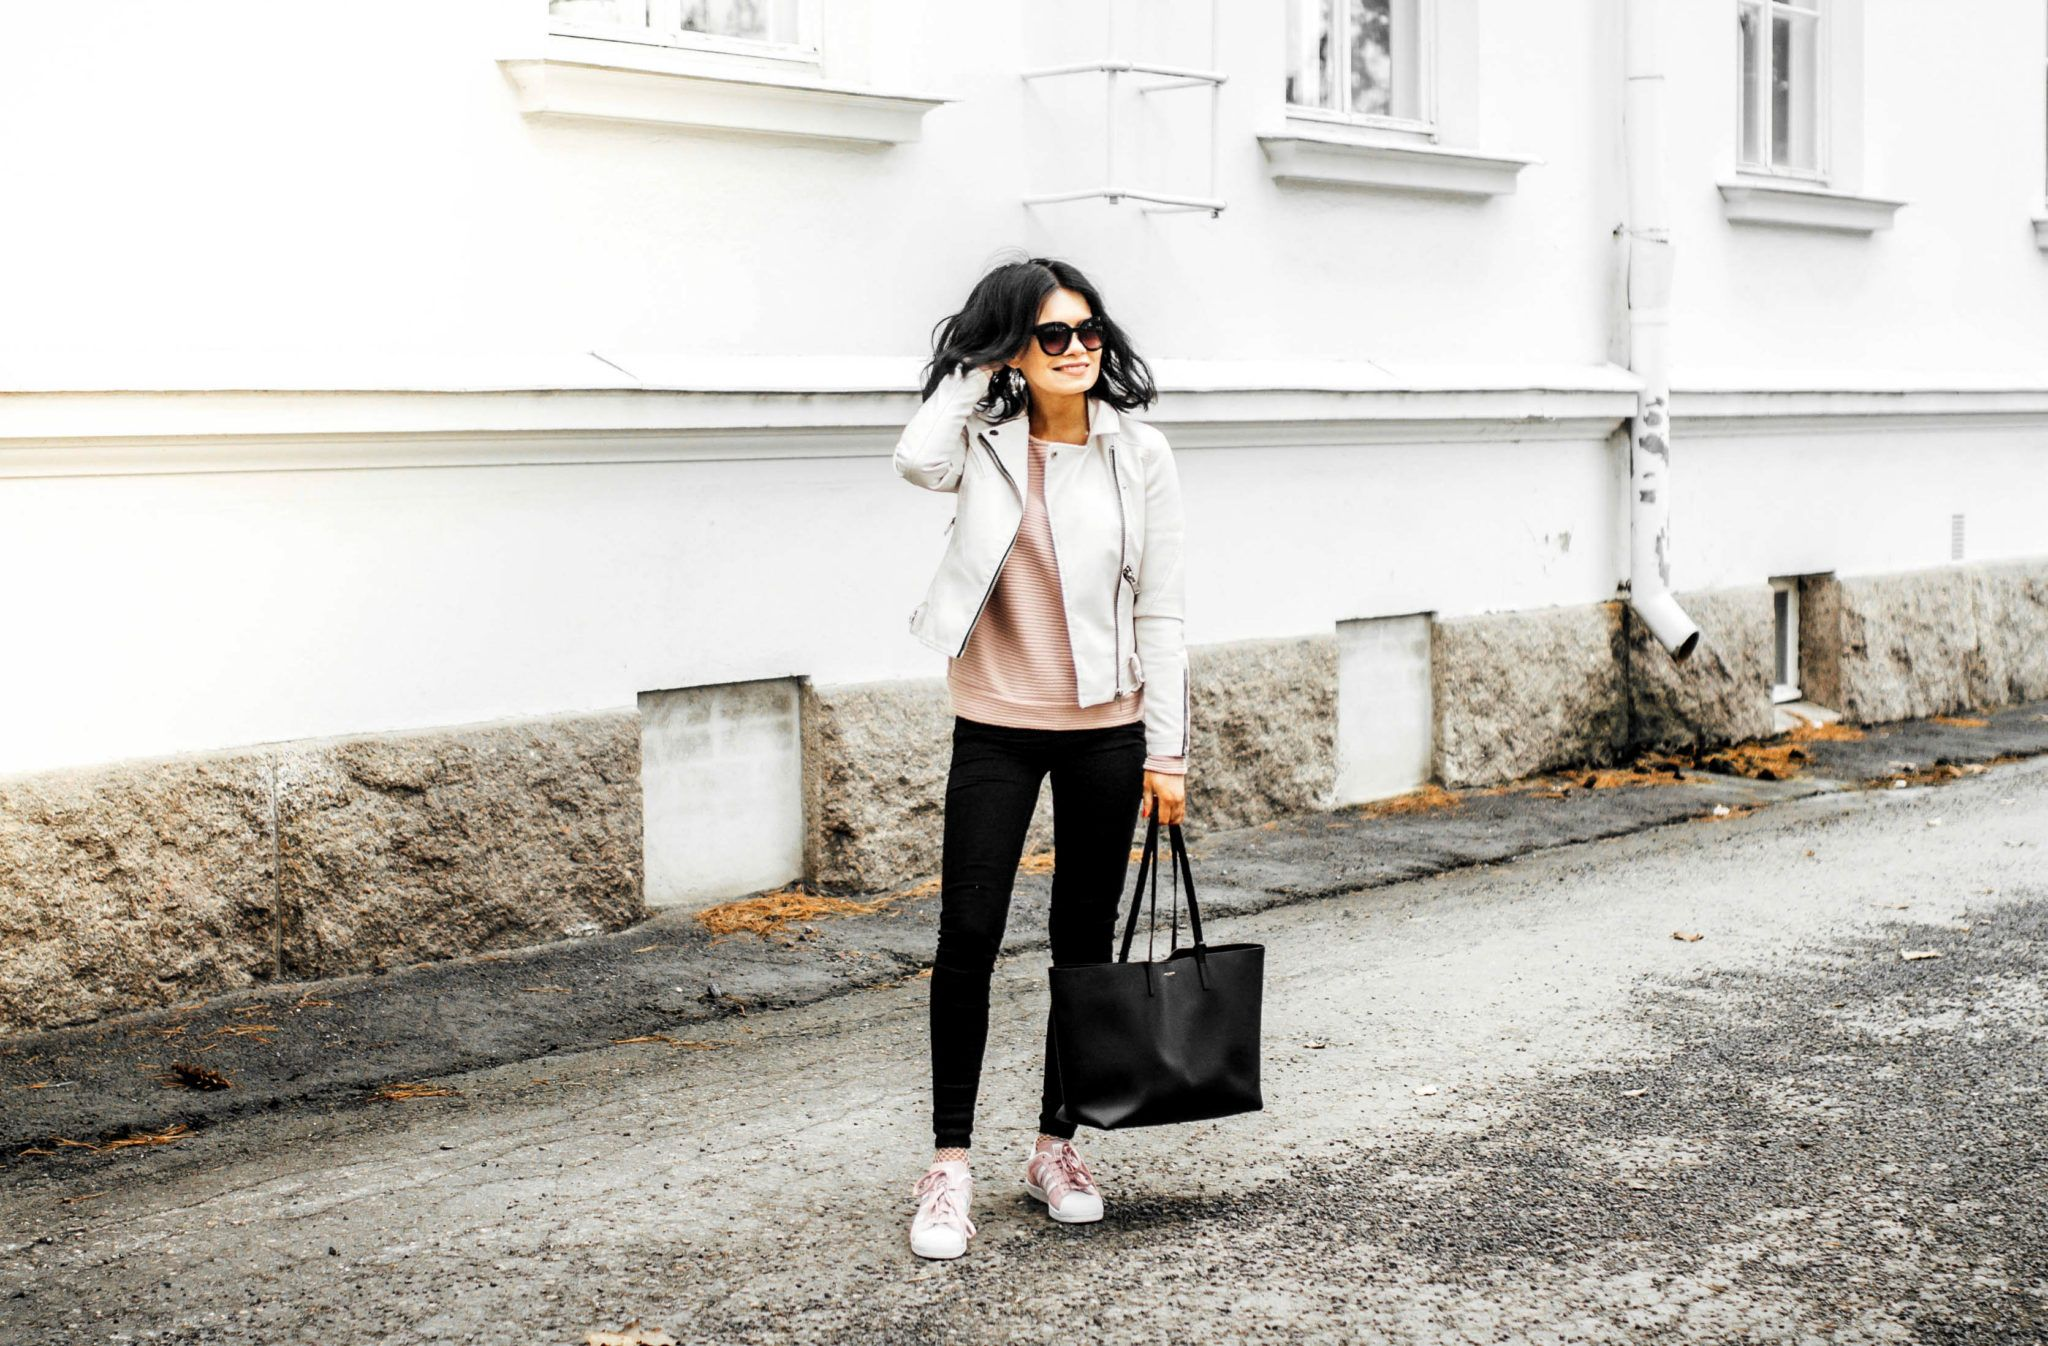 Fashion arkistot - Saijis